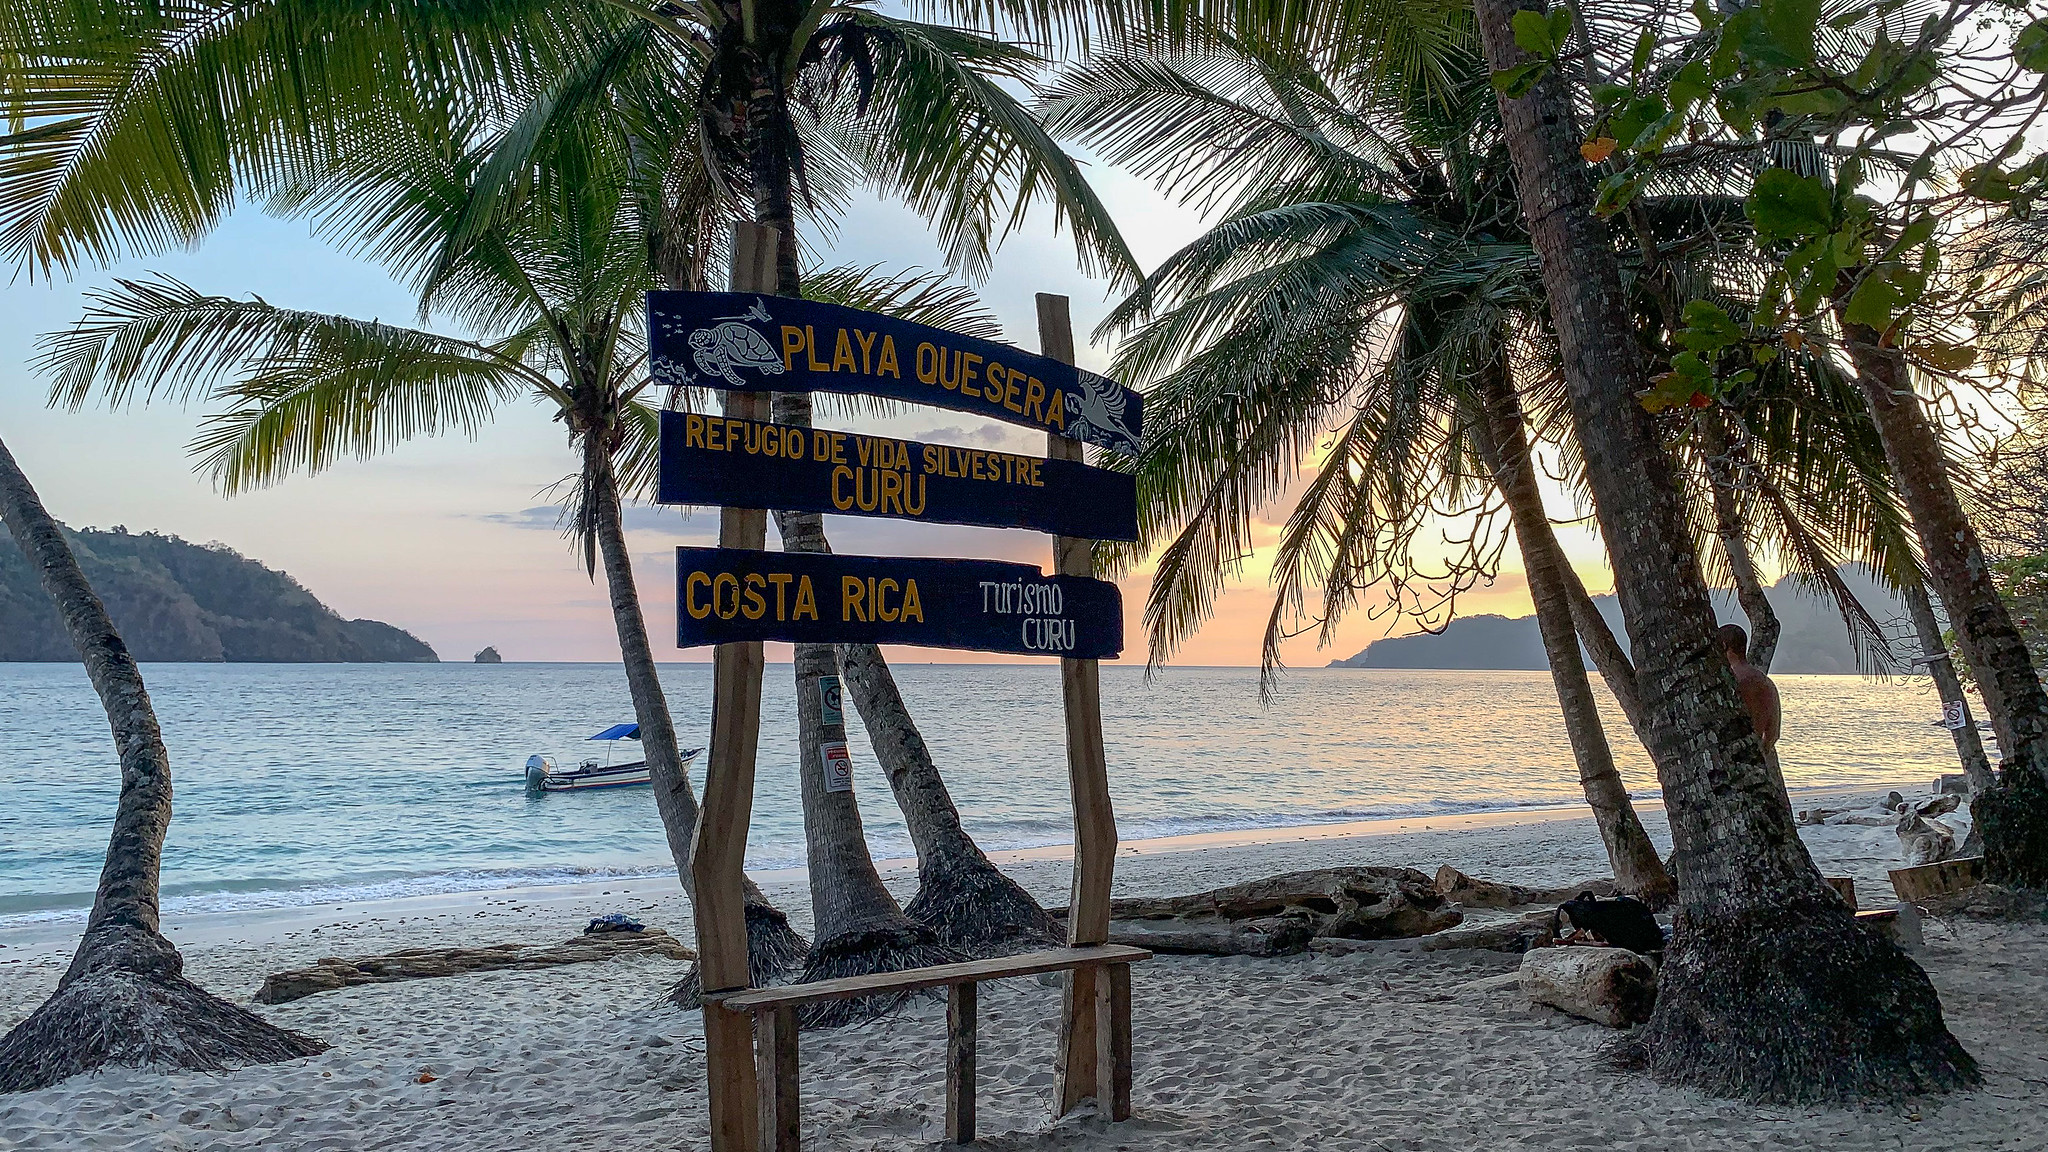 Playa Quesara - [Costa Rica]